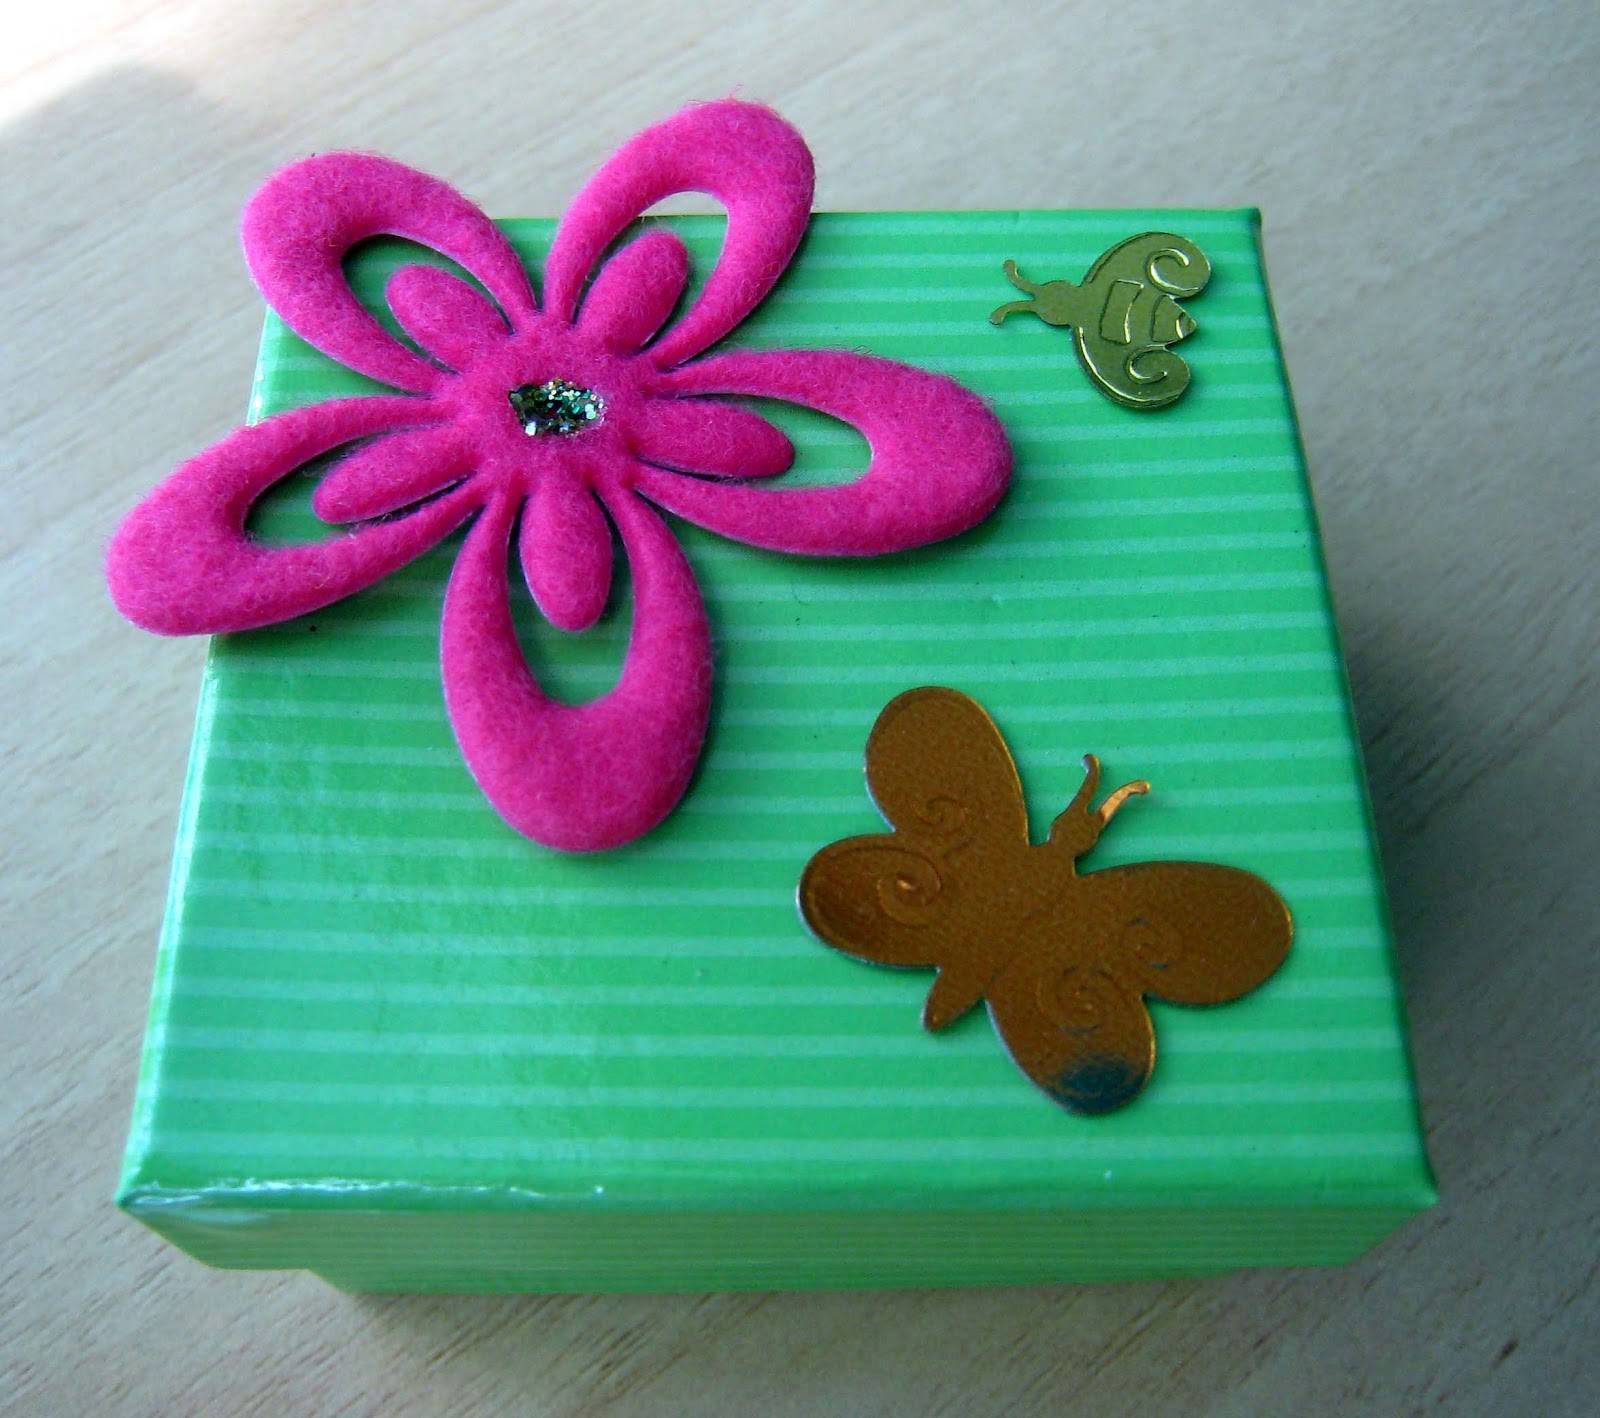 Manualidades cajas de carton decoradas imagui - Manualidades cajas decoradas ...